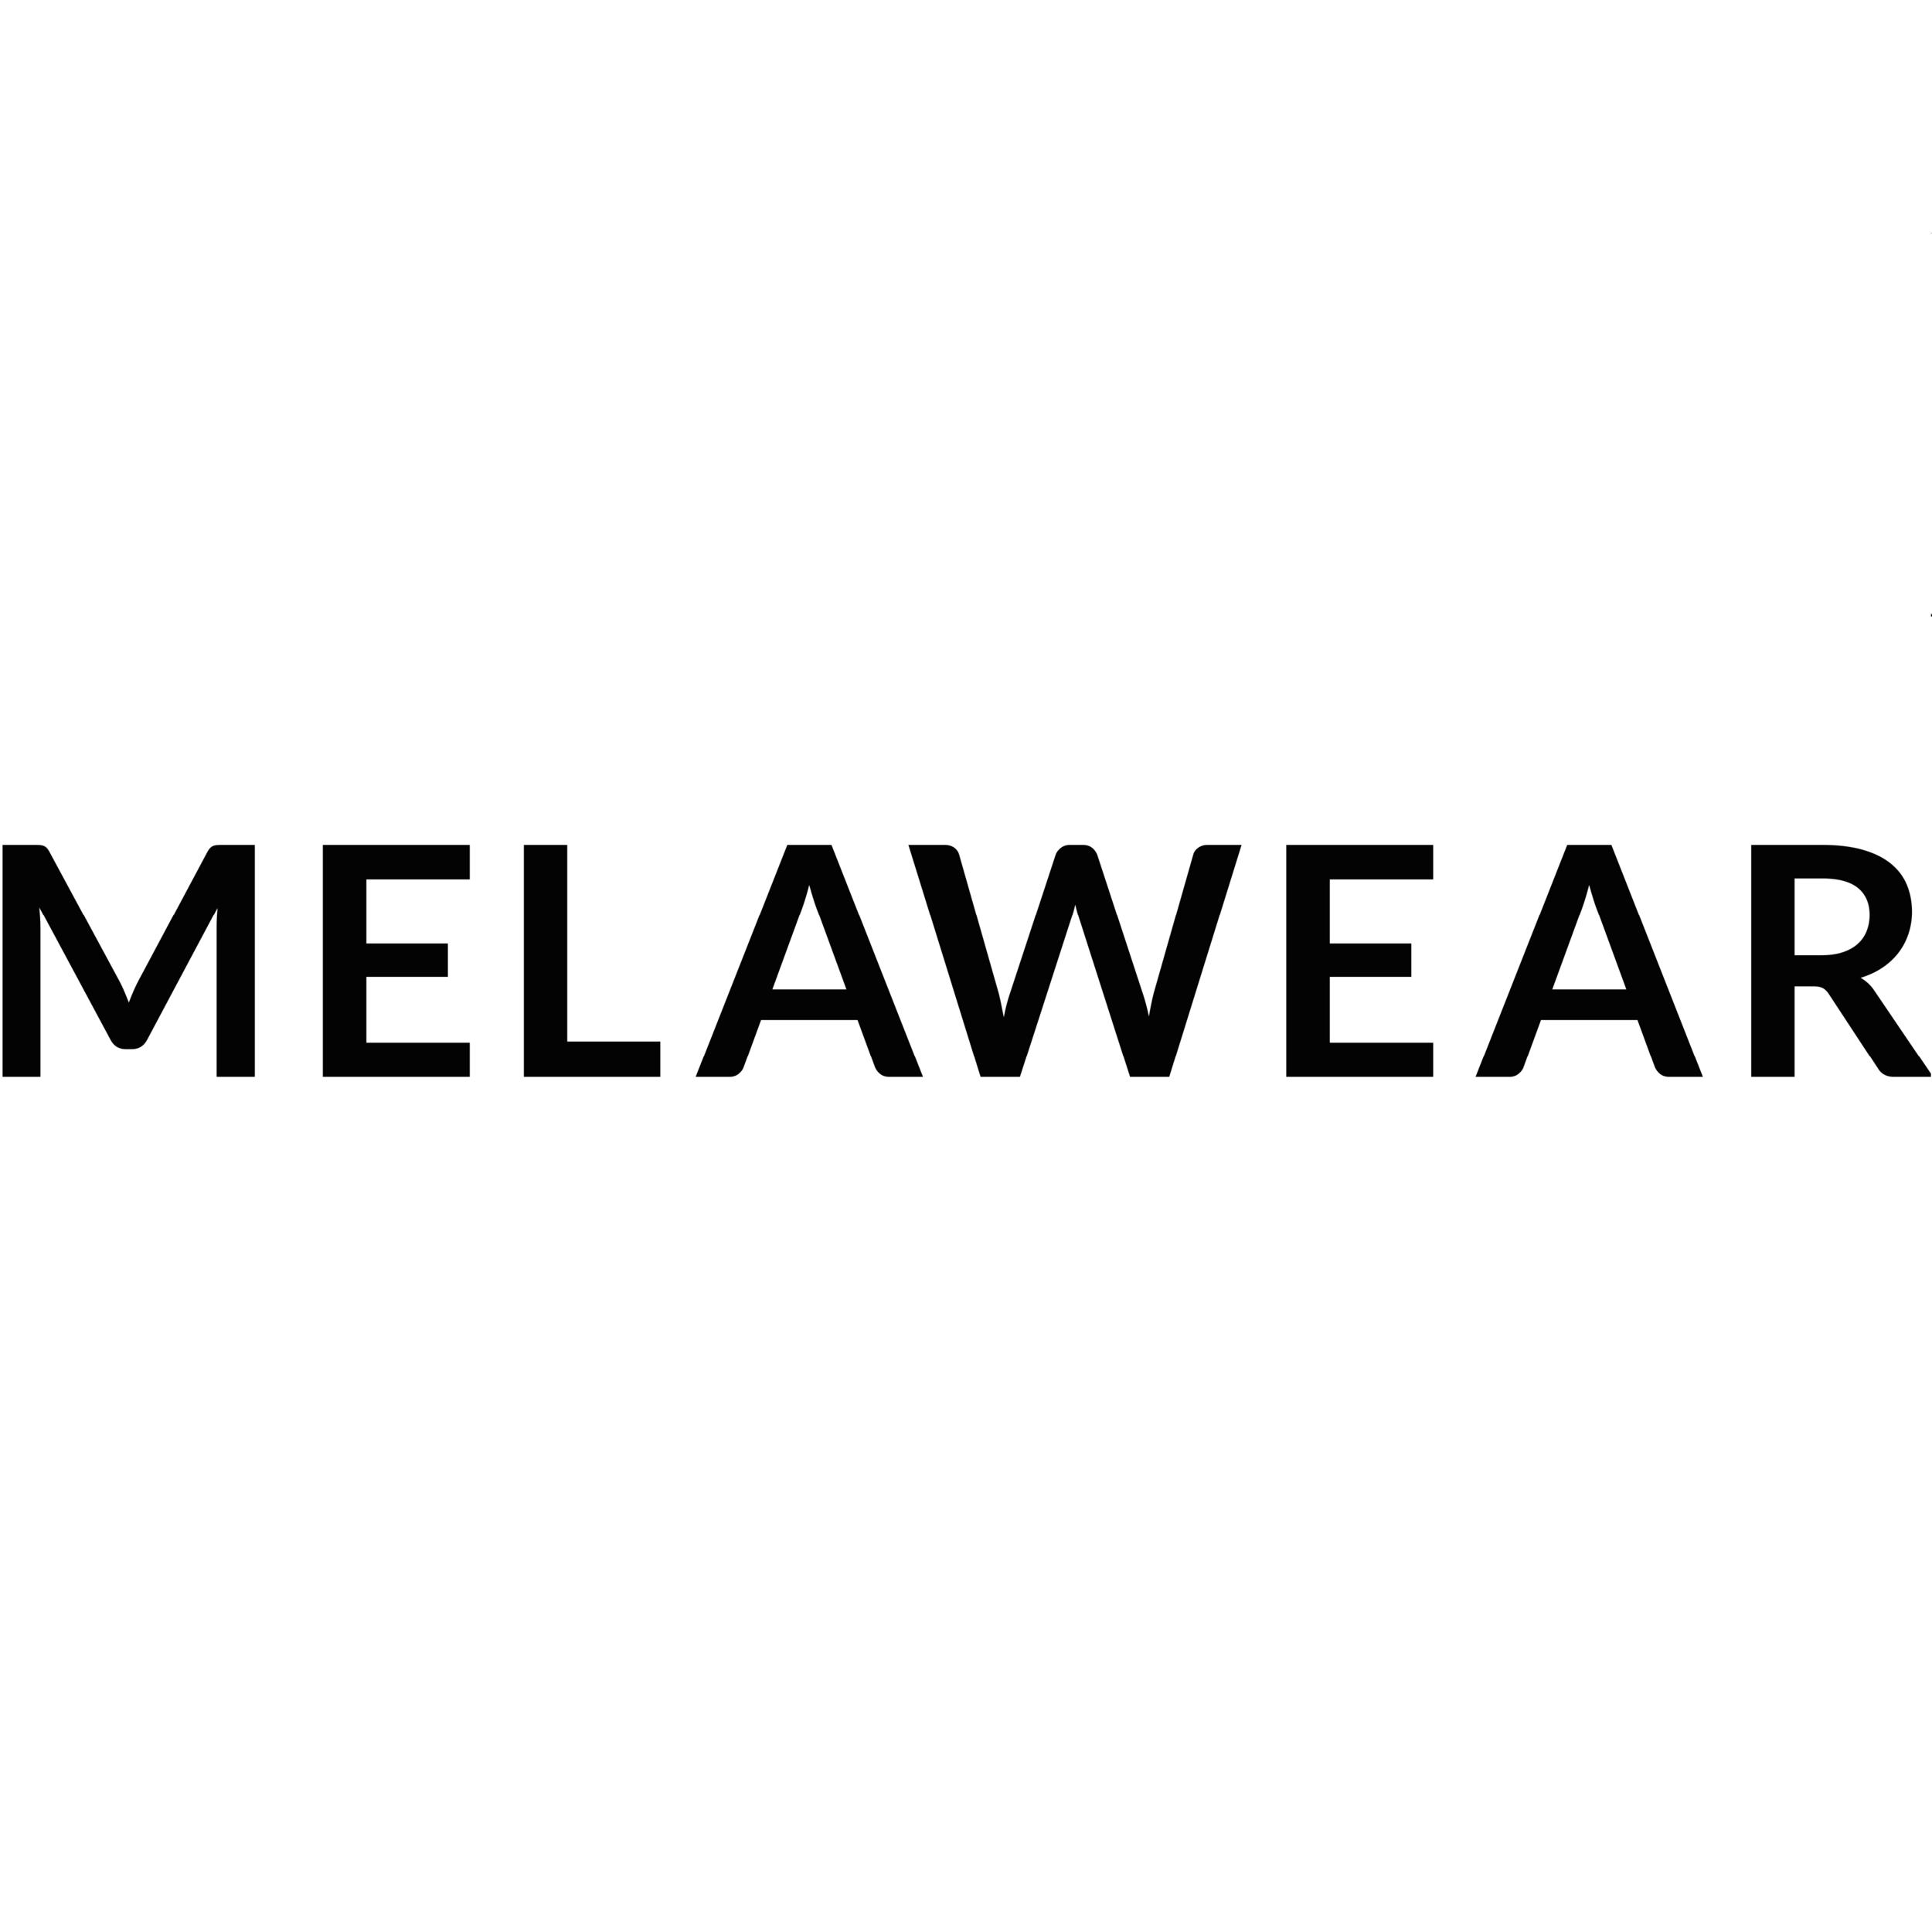 MELAWEAR.png